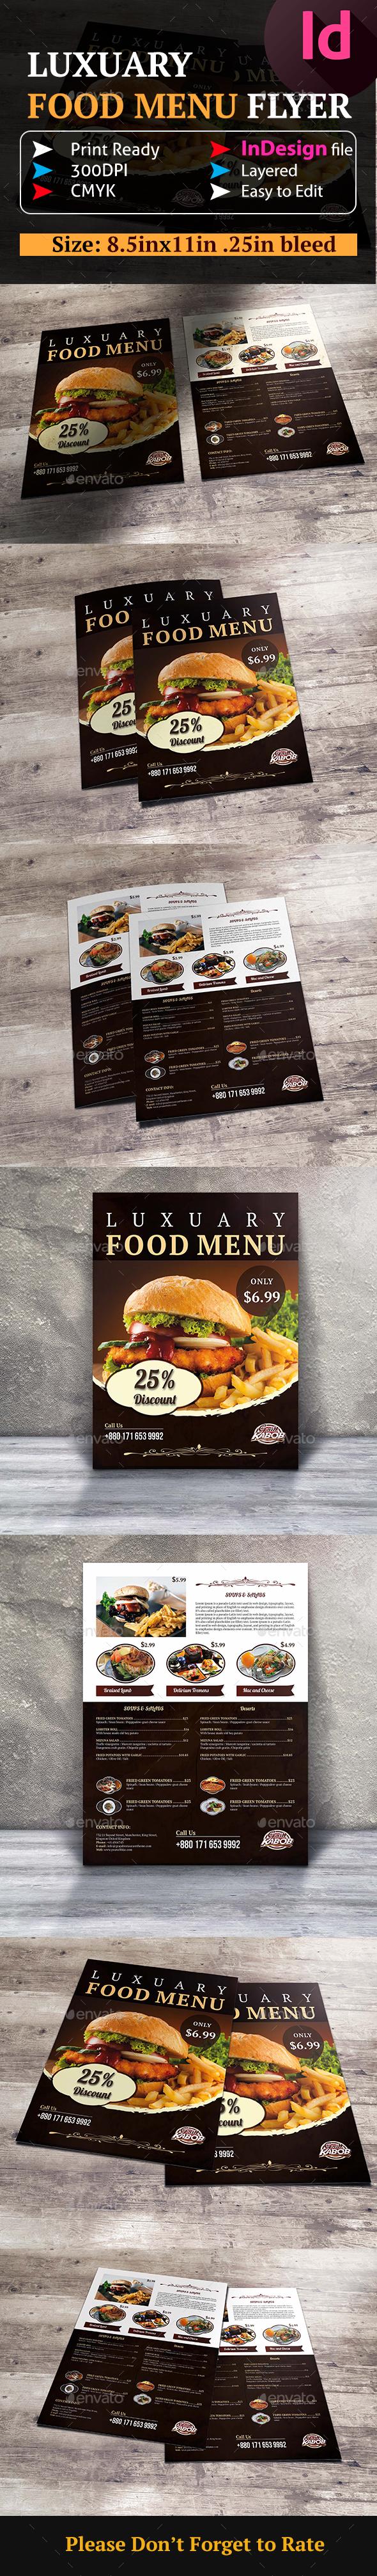 Food Menu Flyer - Restaurant Flyers